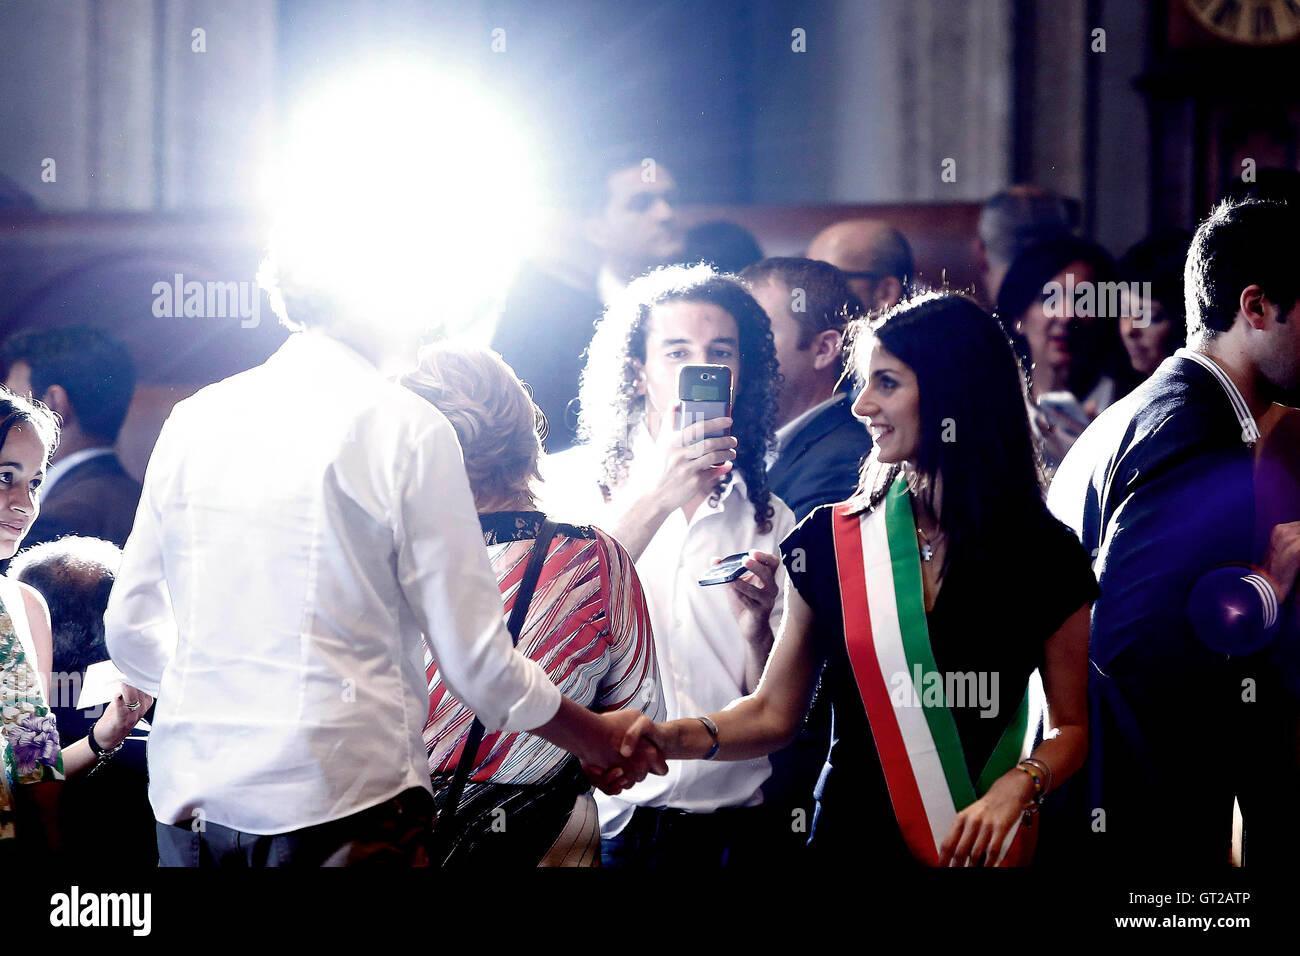 Virginie Raggi Rome 8 septembre 2016 Circulation 5 étoile partie. Samantha Zucchi Insidefoto Photo Banque D'Images